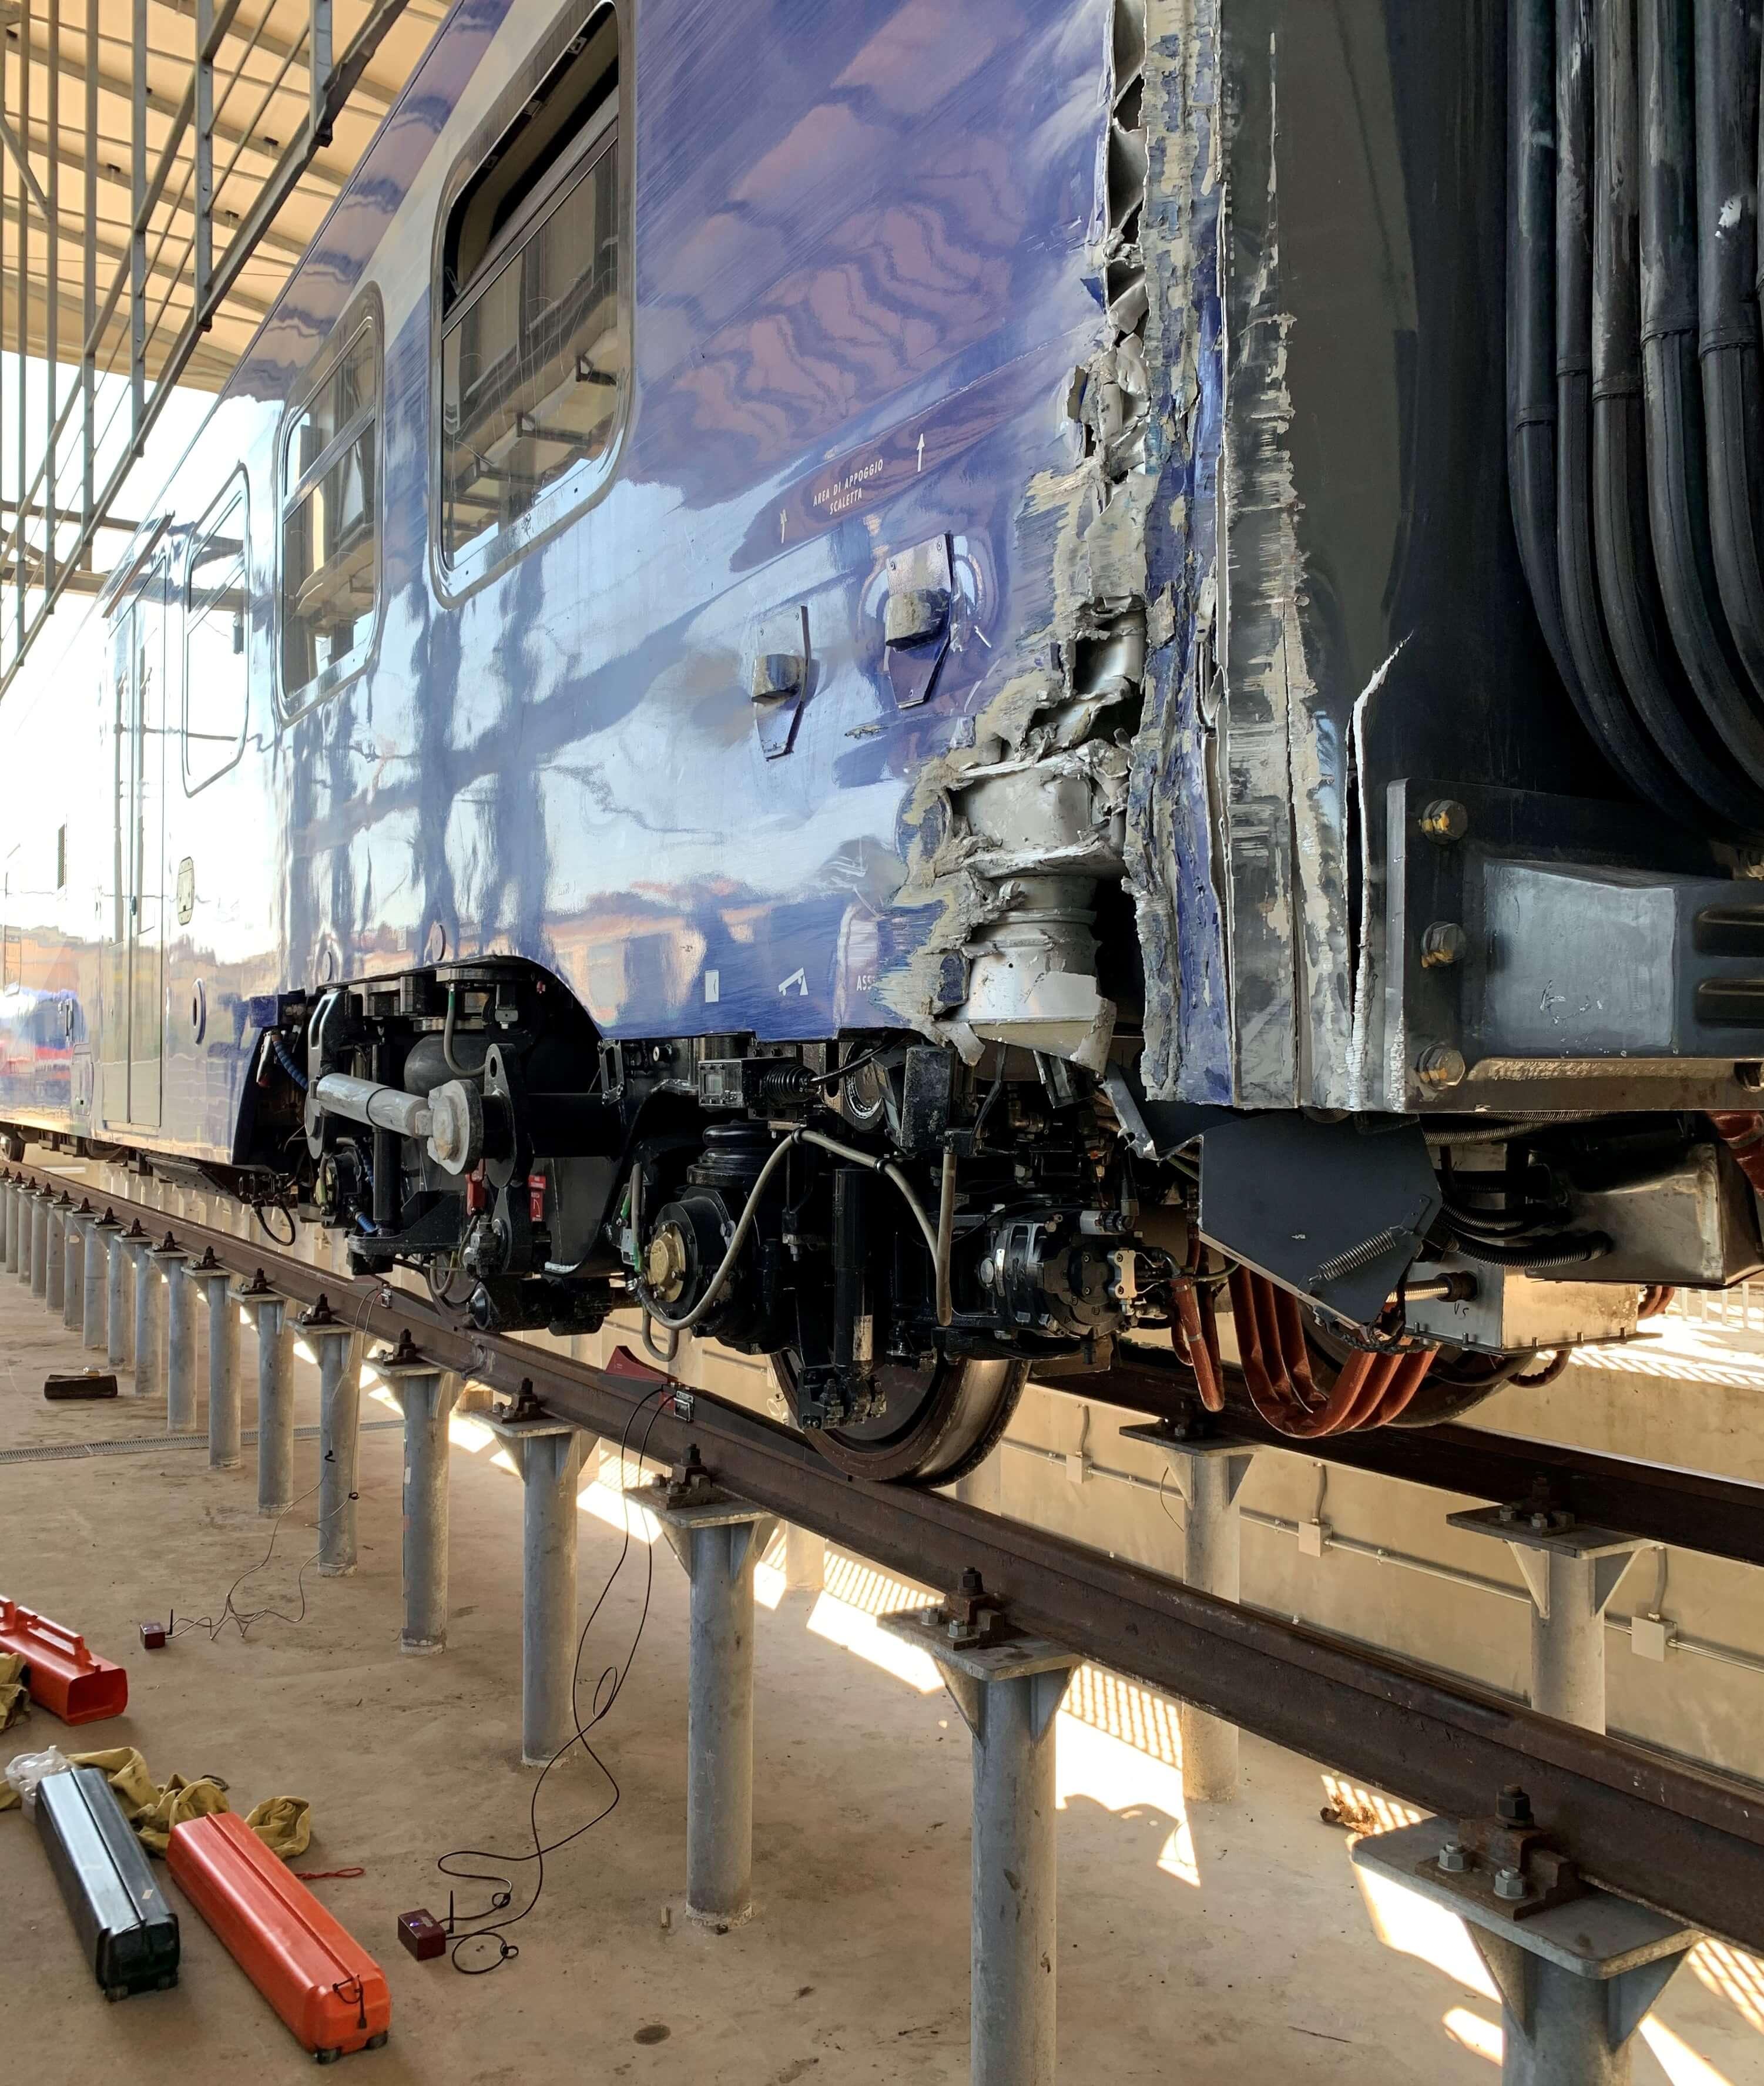 sistema di pesatura portatile per misure del treno EAV